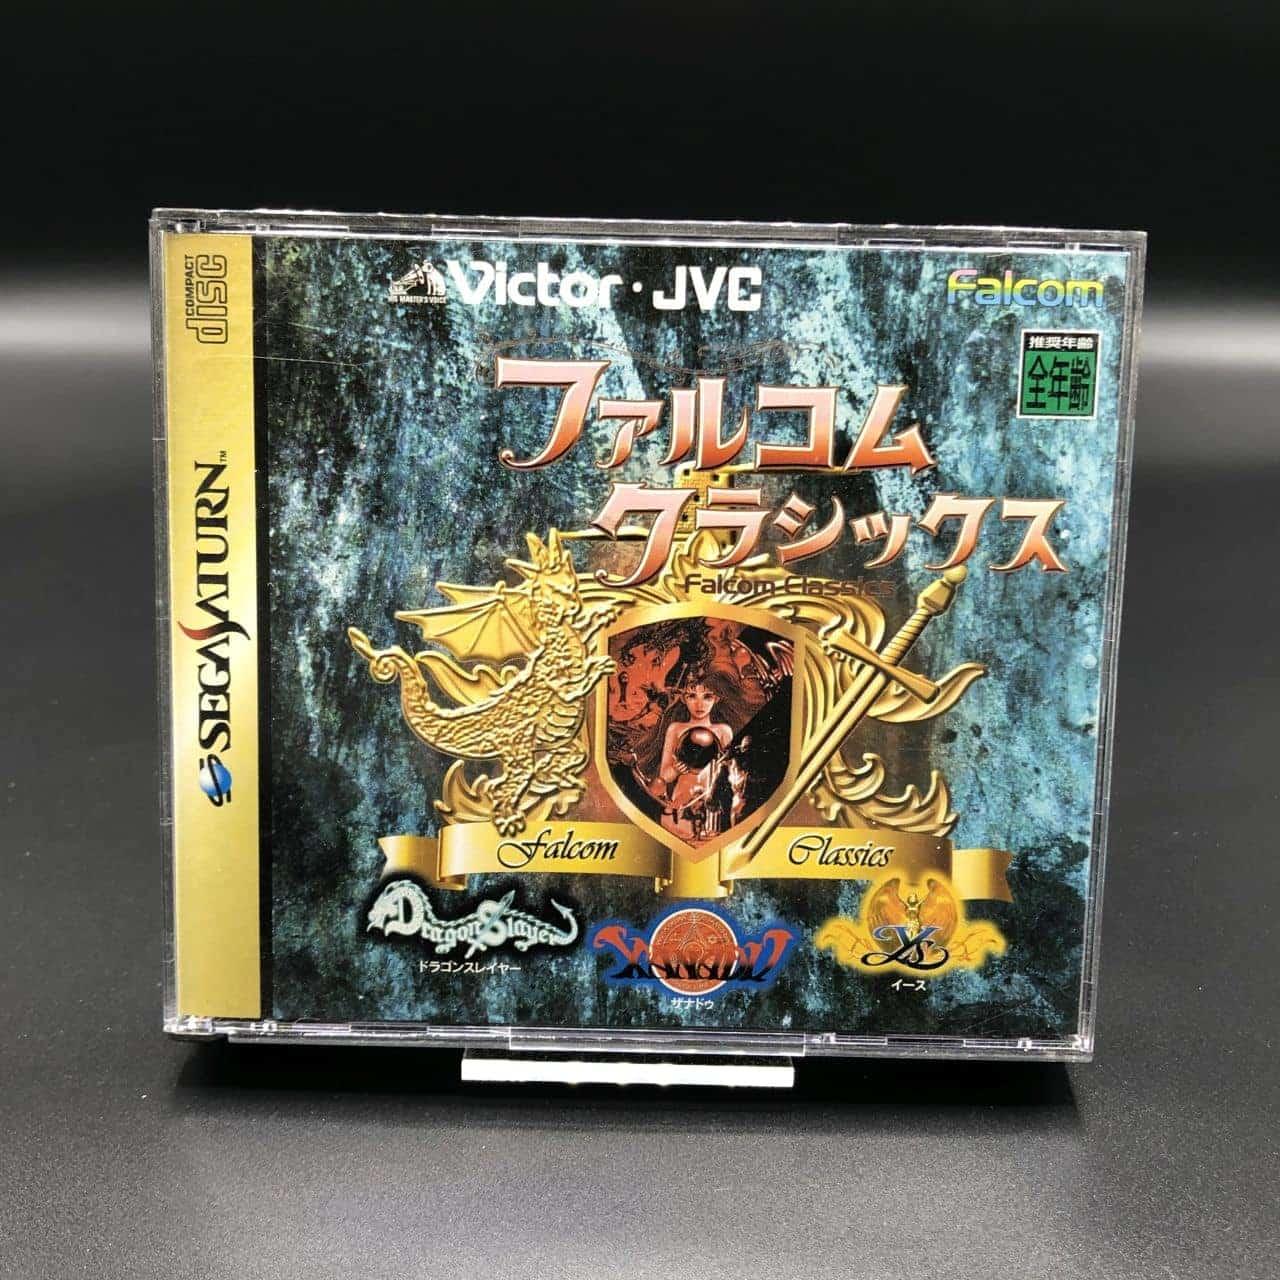 Falcom Classics I (Import Japan) (Komplett) (Sehr gut) Sega Saturn